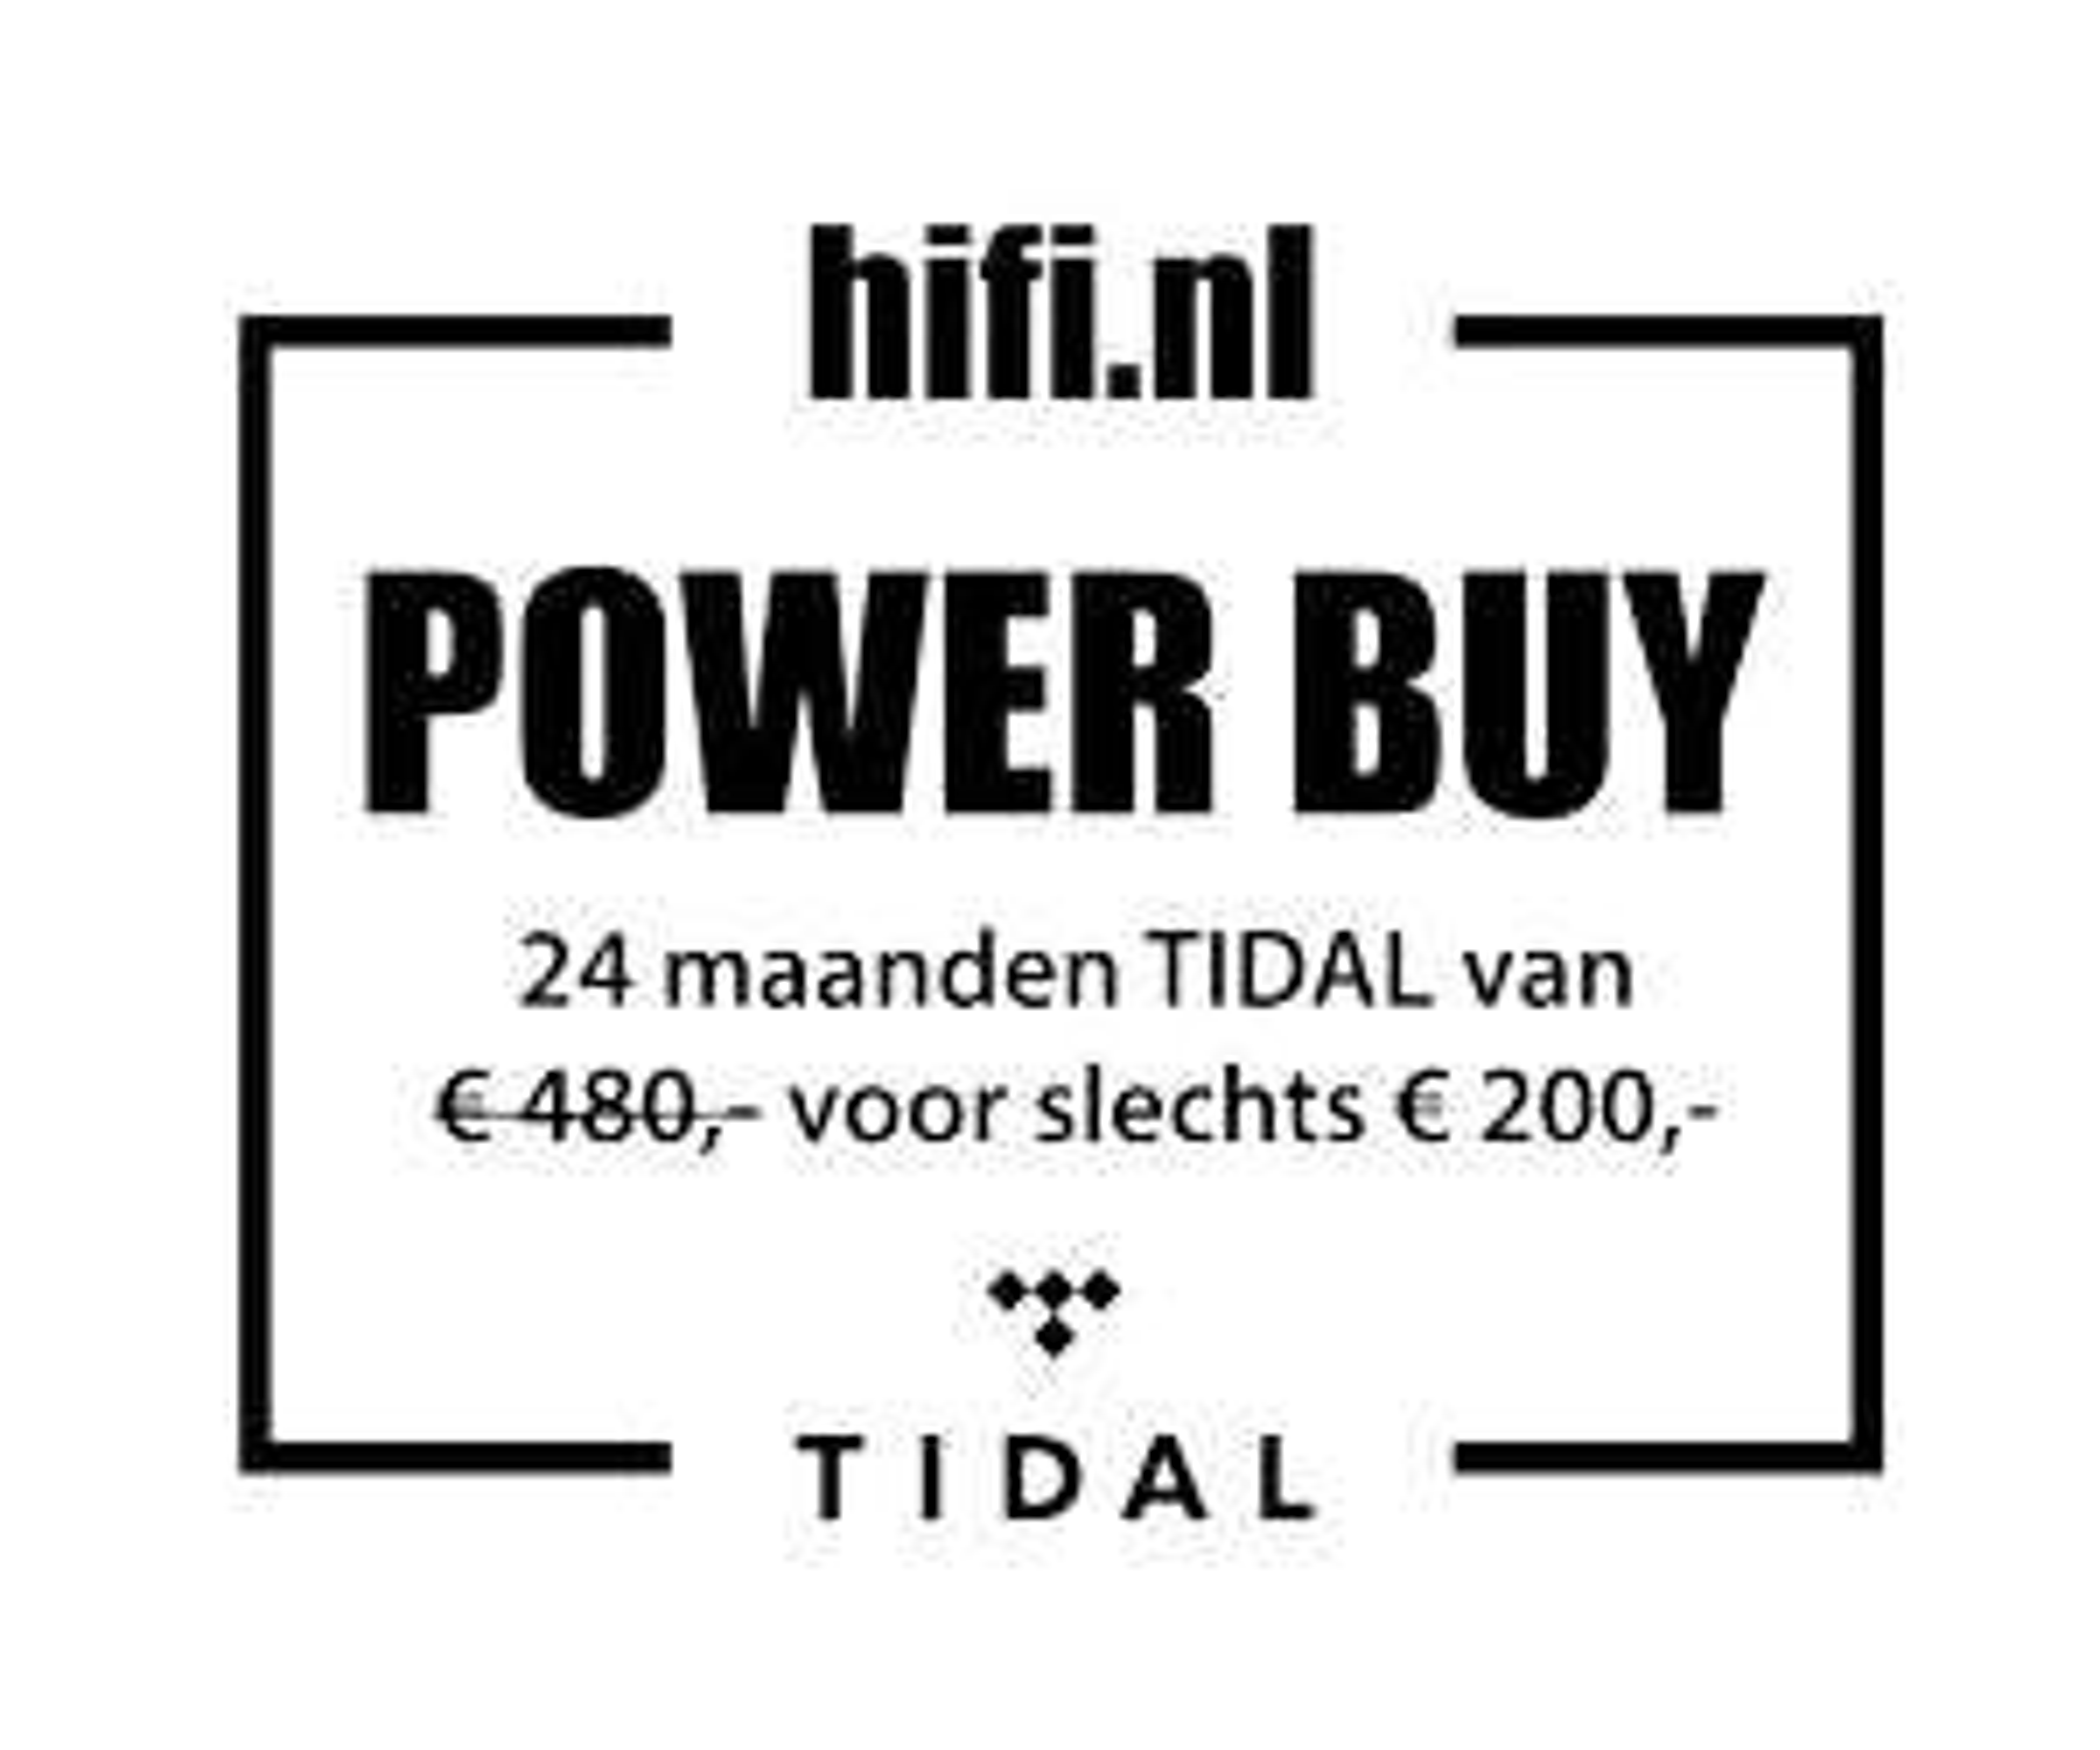 2 jaar Tidal HiFi voor € 200 i.p.v. € 480